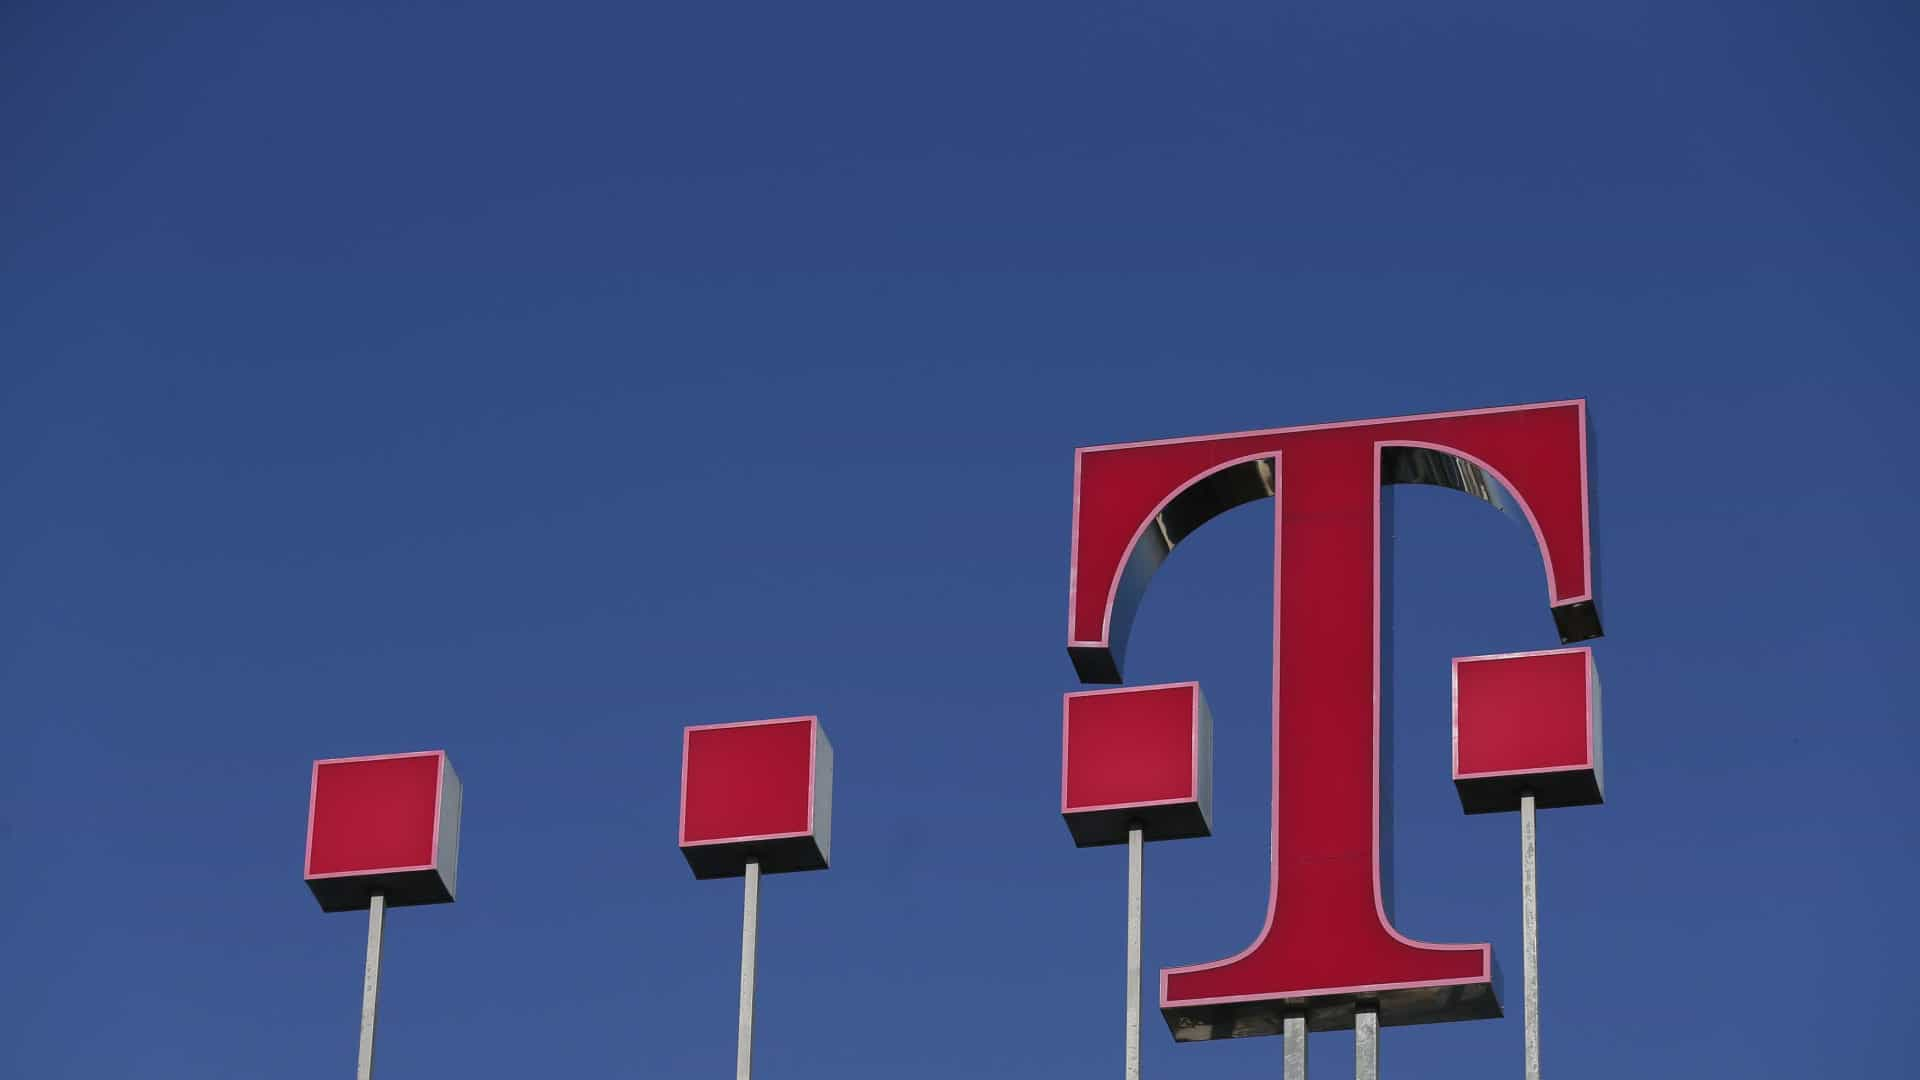 Lucro da Deutsche Telekom recua 56,7% no 1.º semestre